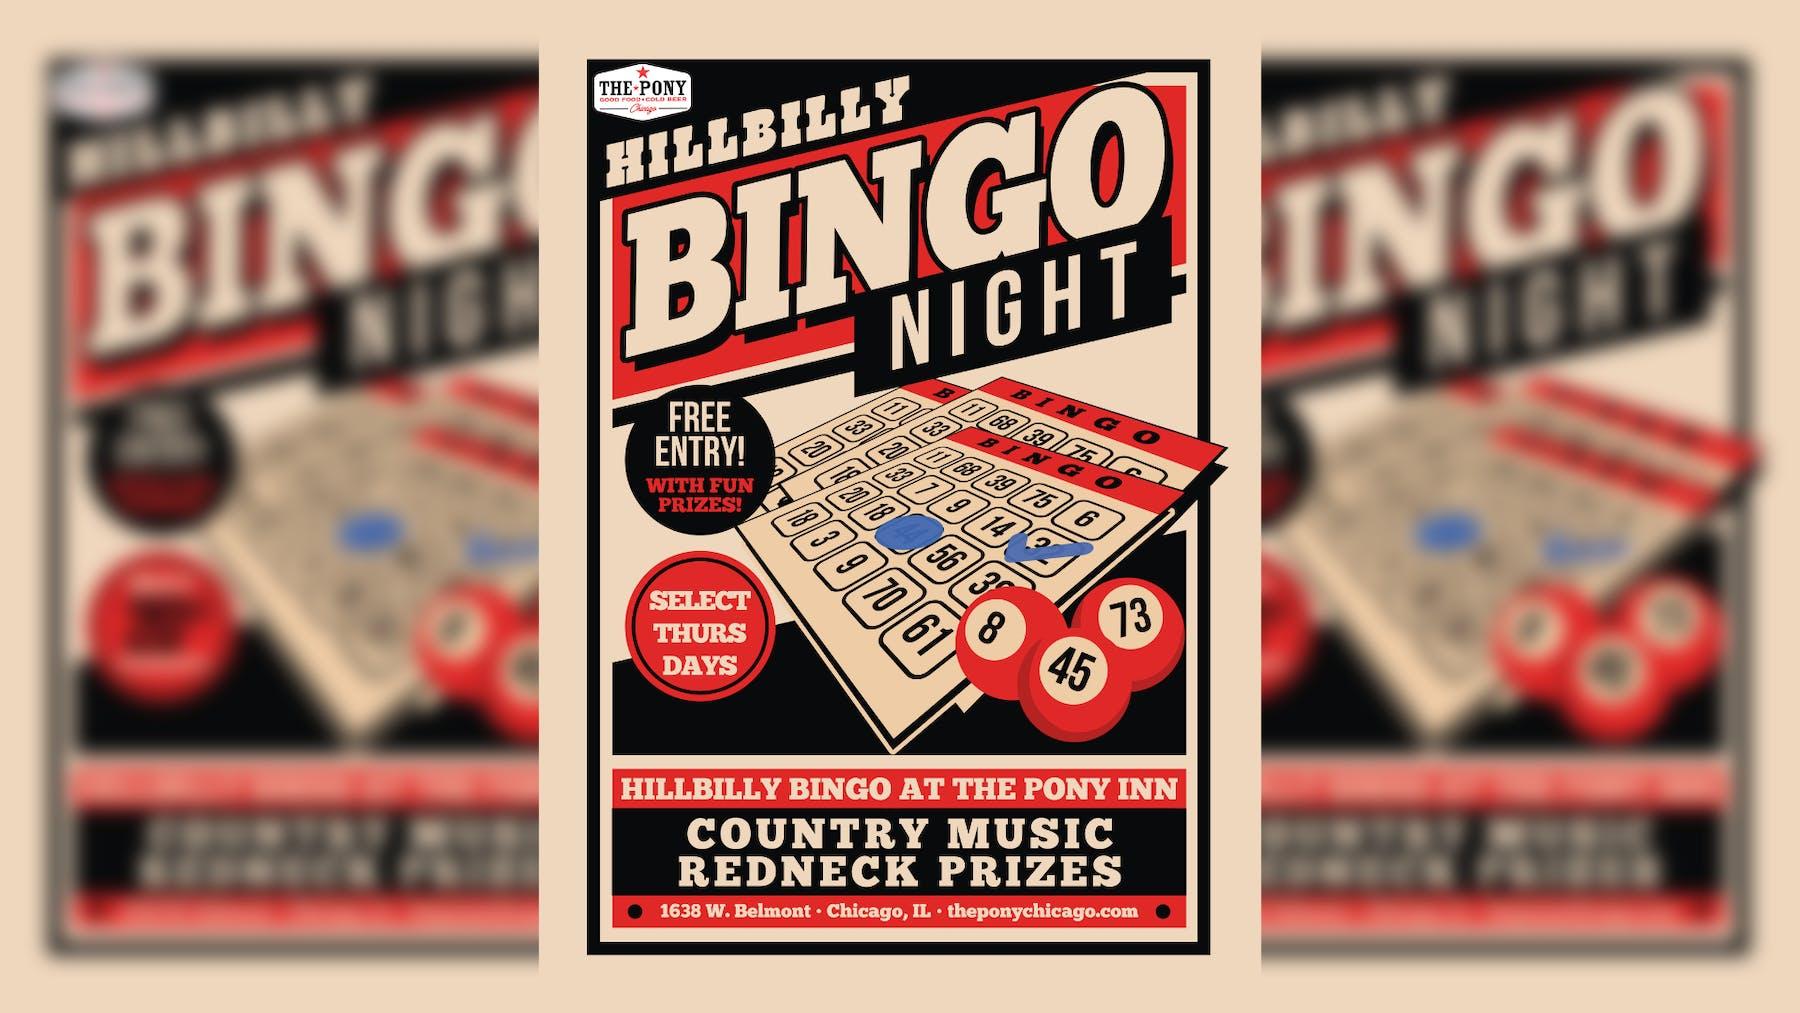 Bingo night at the pony